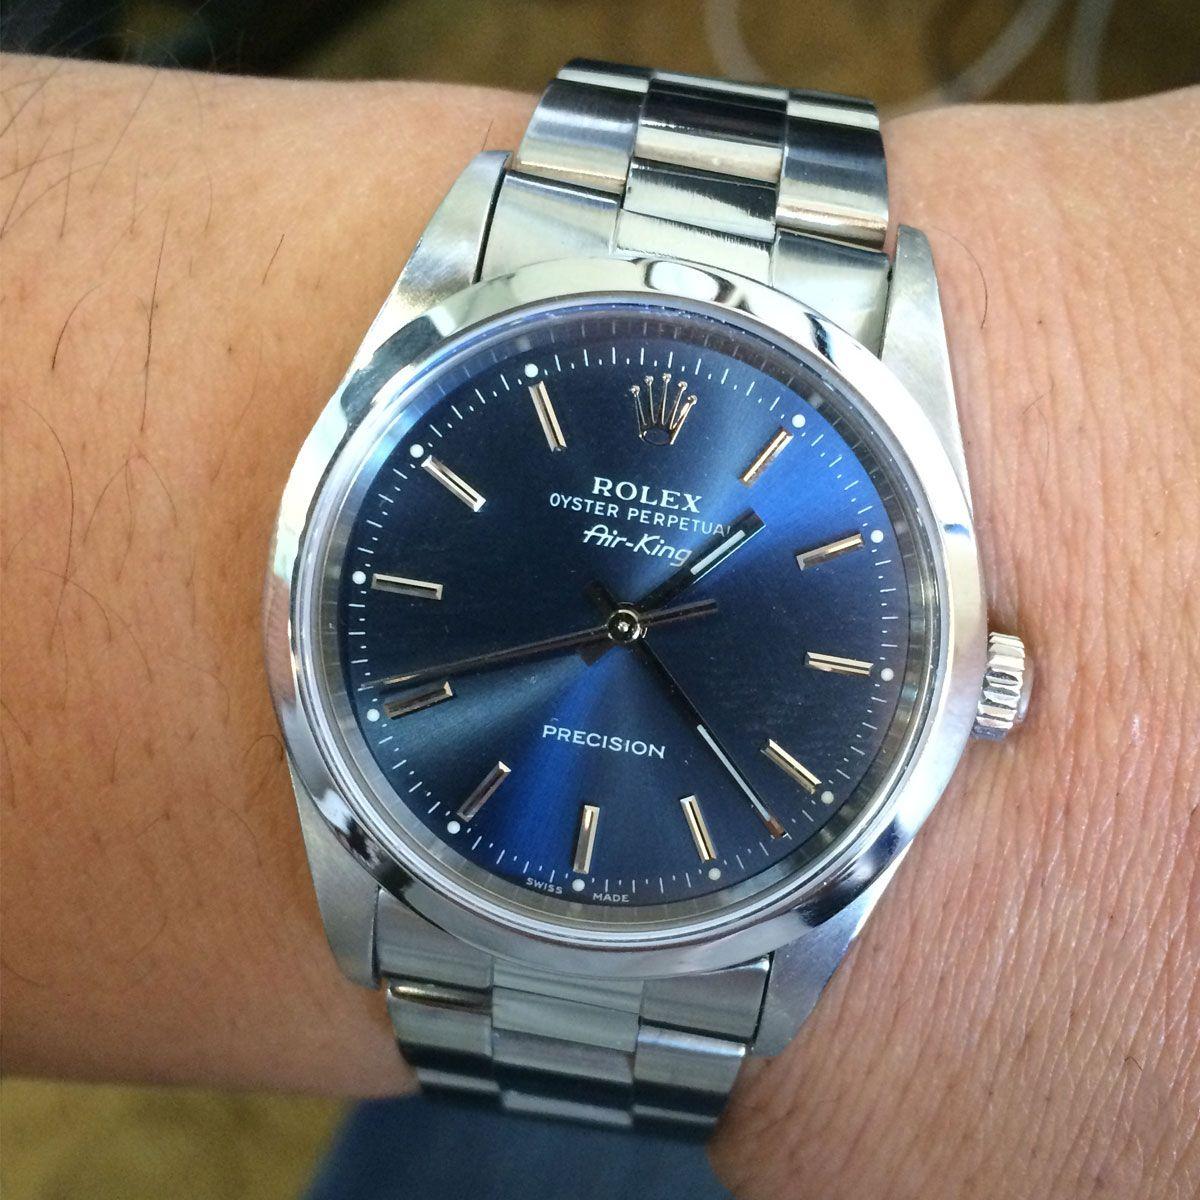 Rolex 14000 Air King Blue Dial Steel Watch Rolex, Rolex